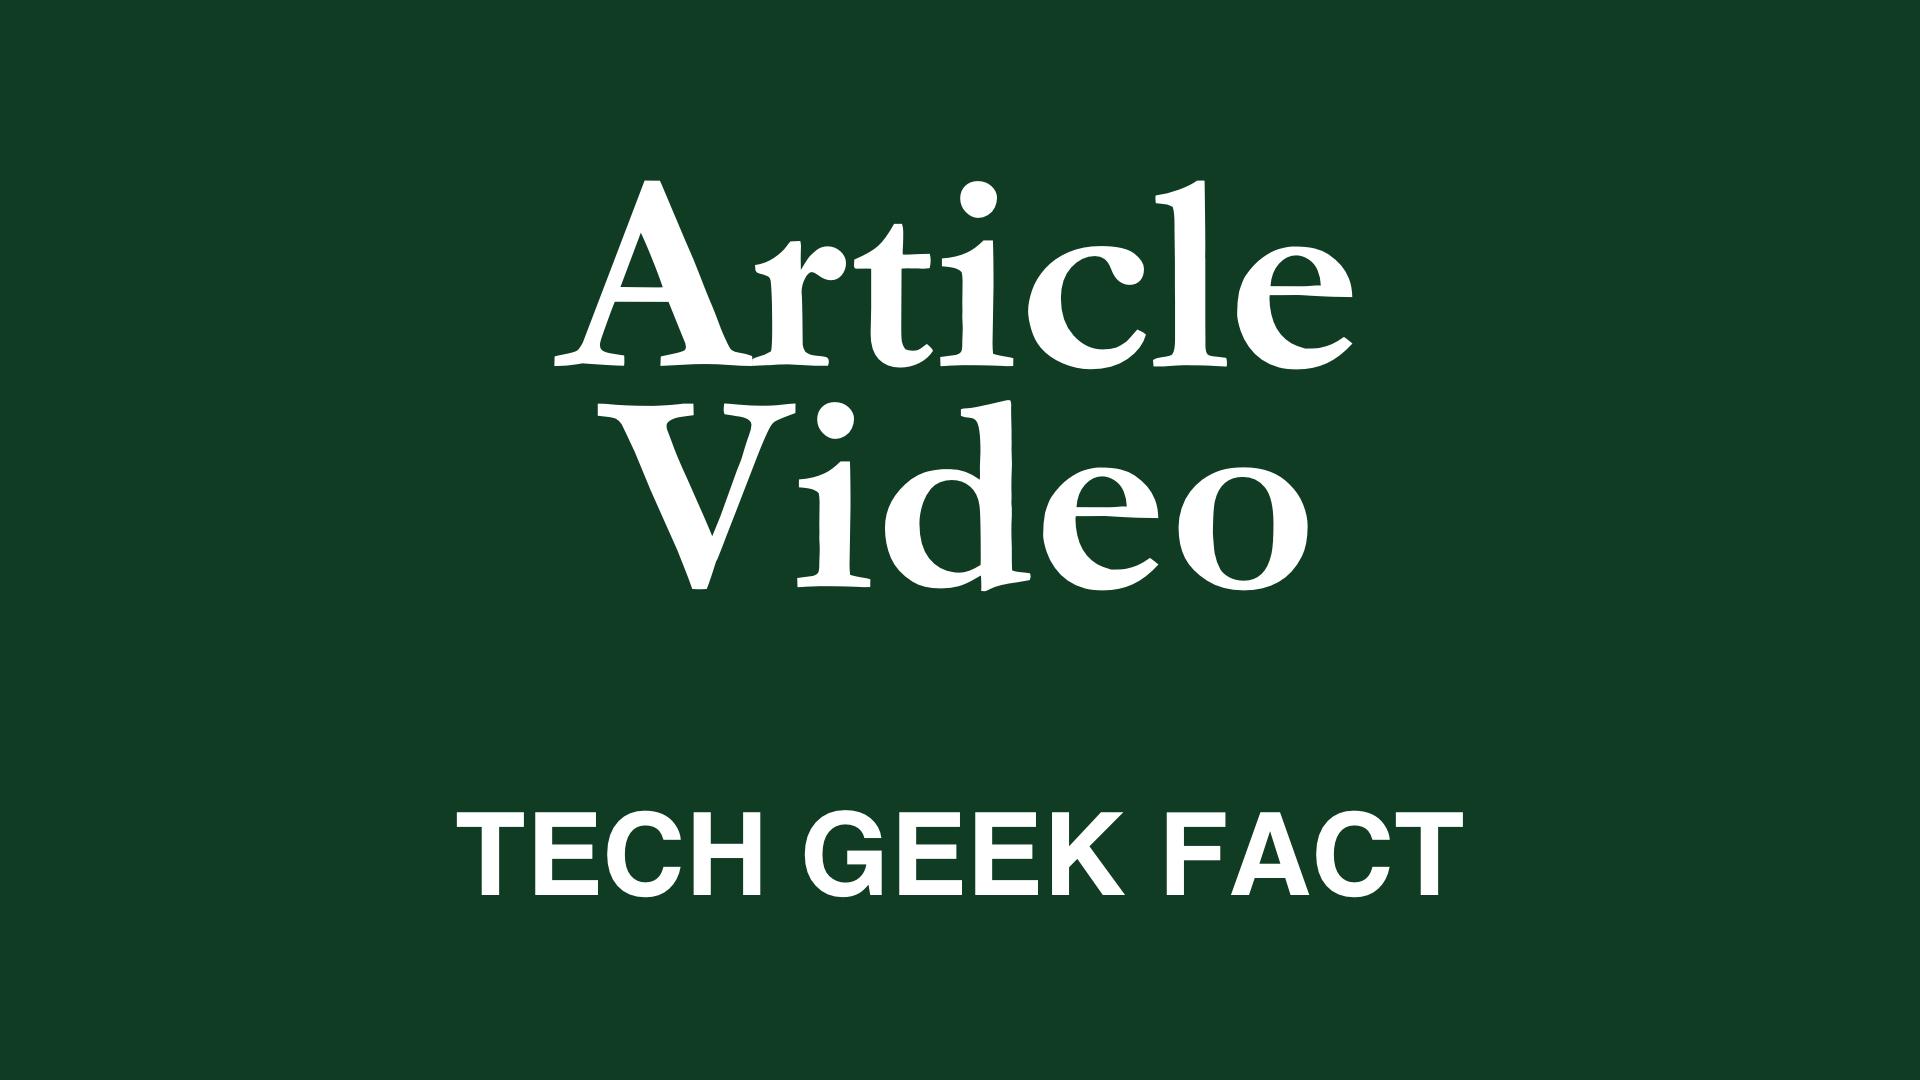 Welcome to Tech Geek Fact